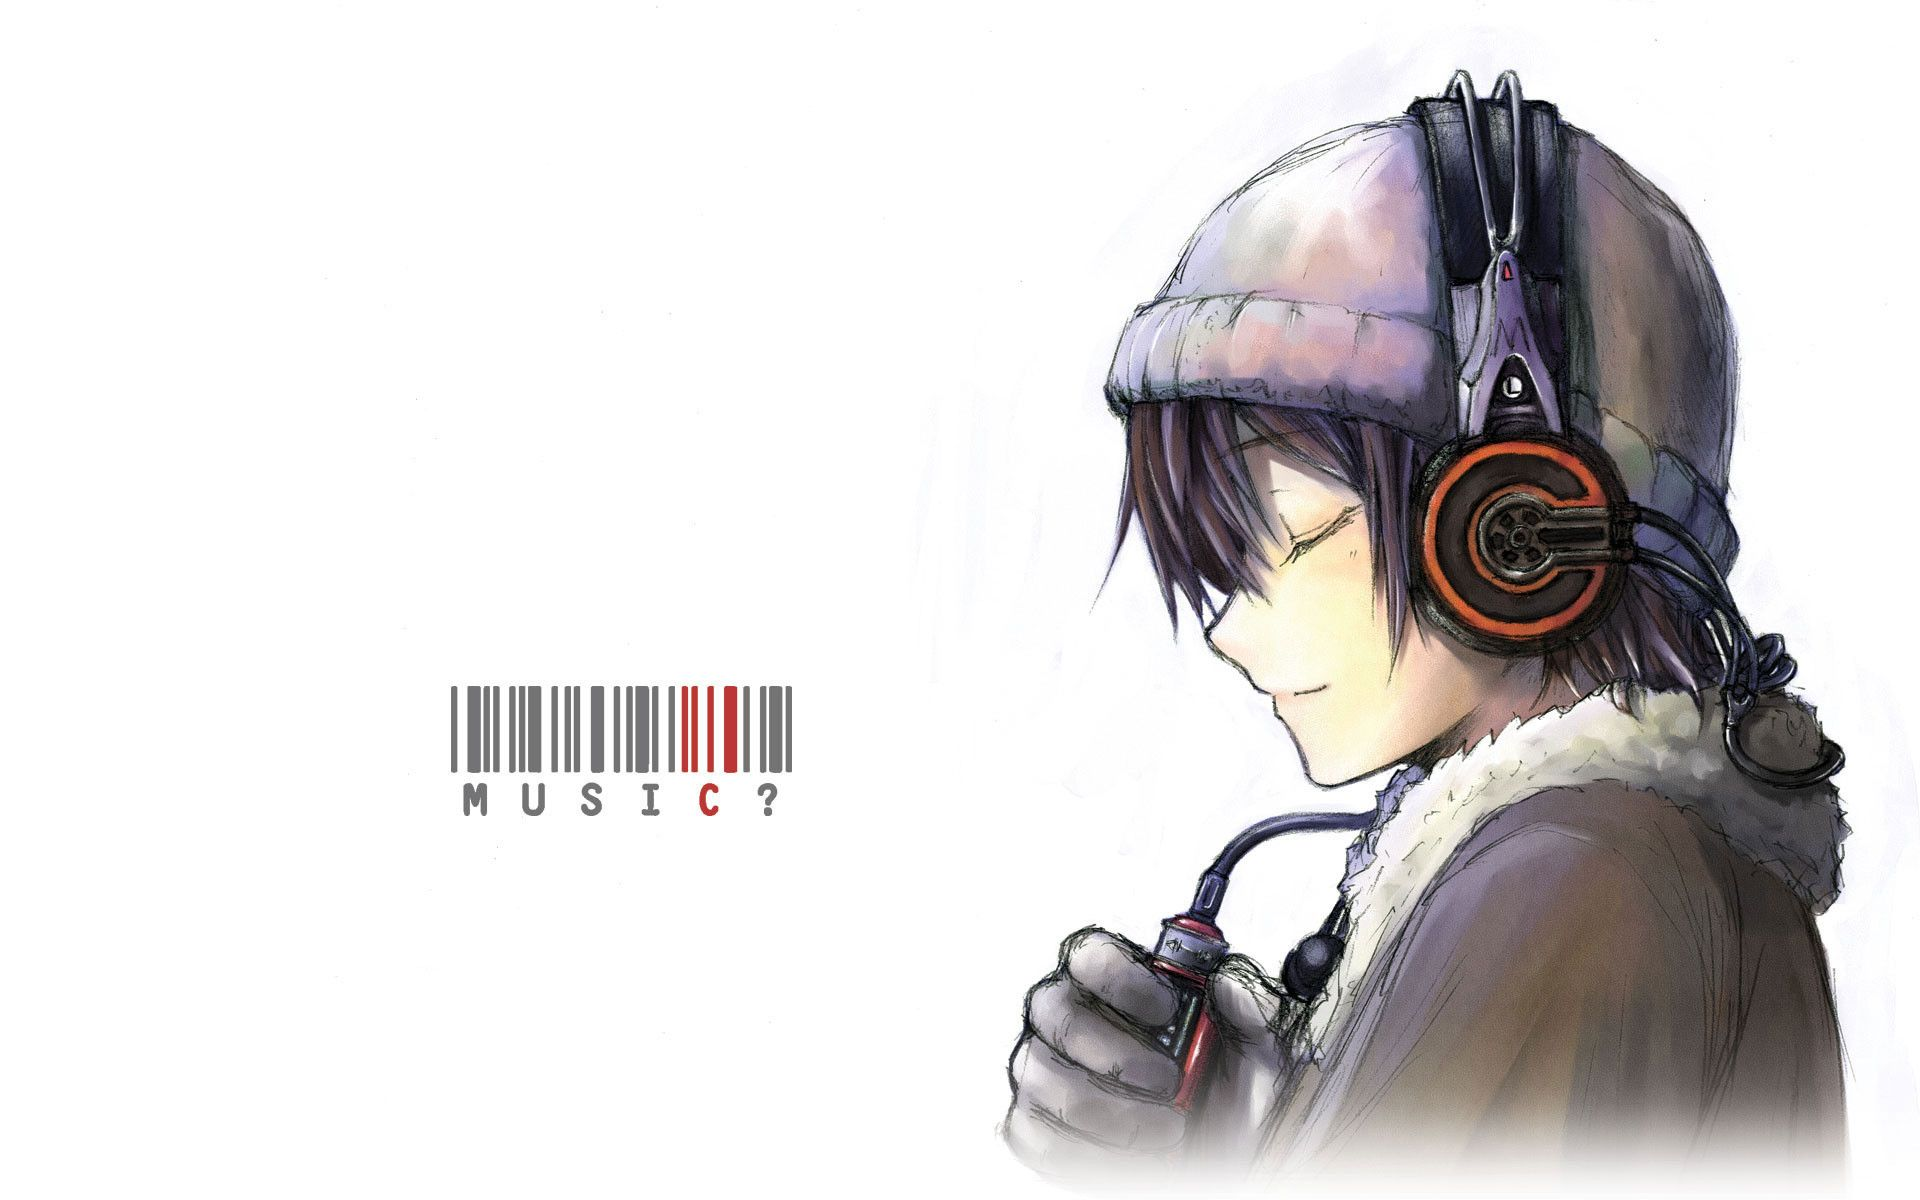 Anime Wallpapers Anime Boy With Headphones Anime Music Cute Anime Boy Anime headphones iphone wallpaper